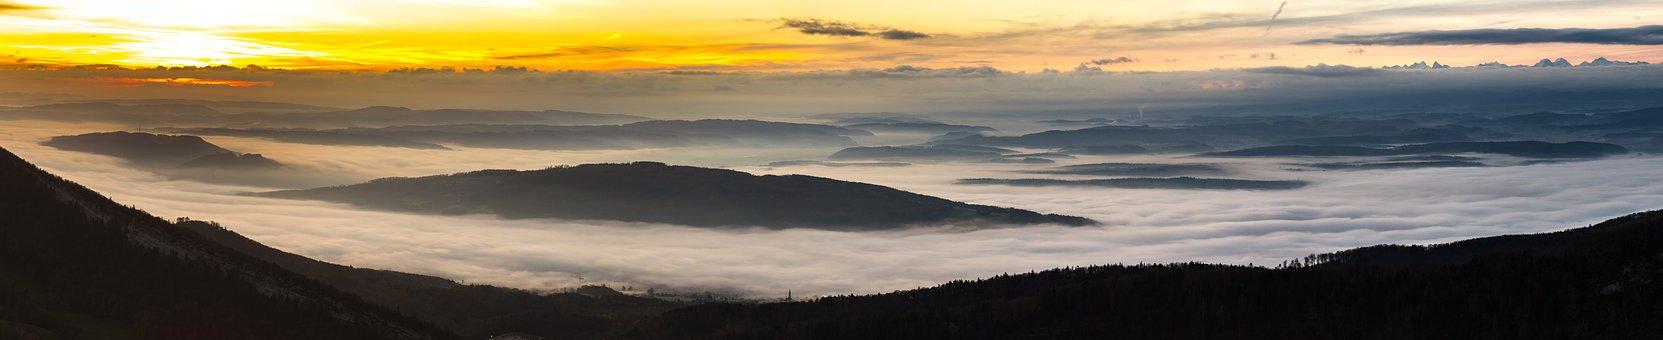 Sunrise, Fog, Morgenstimmung, Morning Sun, Fog Bank